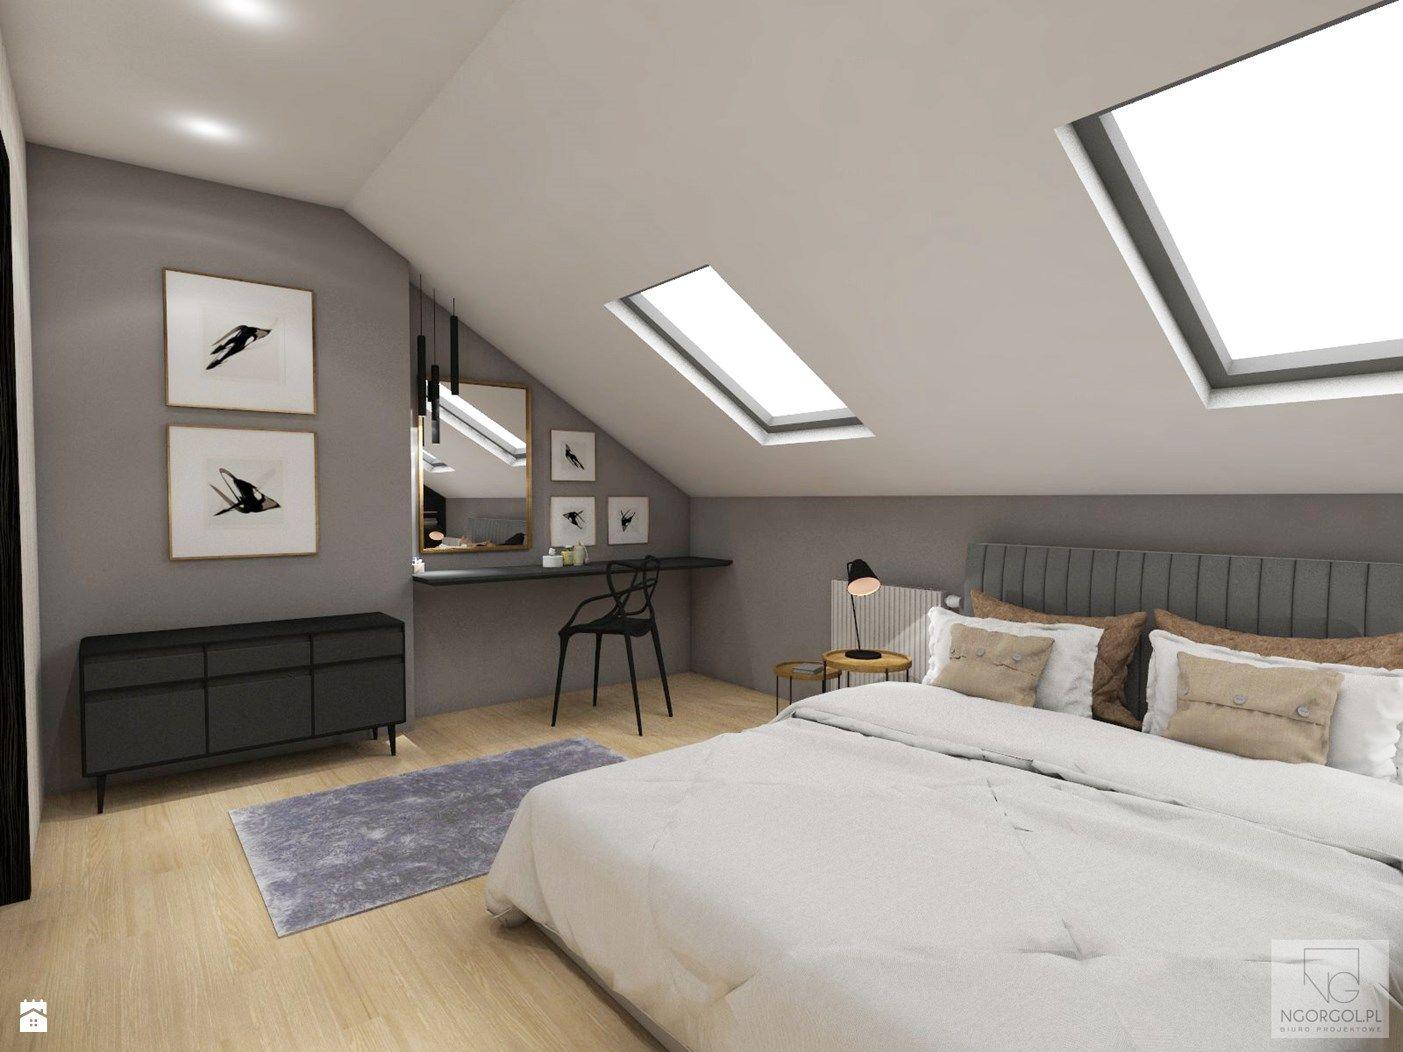 sypialnia na poddaszu proszowice zdj cie od ngorgol sypialnia styl eklektyczny ngorgol. Black Bedroom Furniture Sets. Home Design Ideas